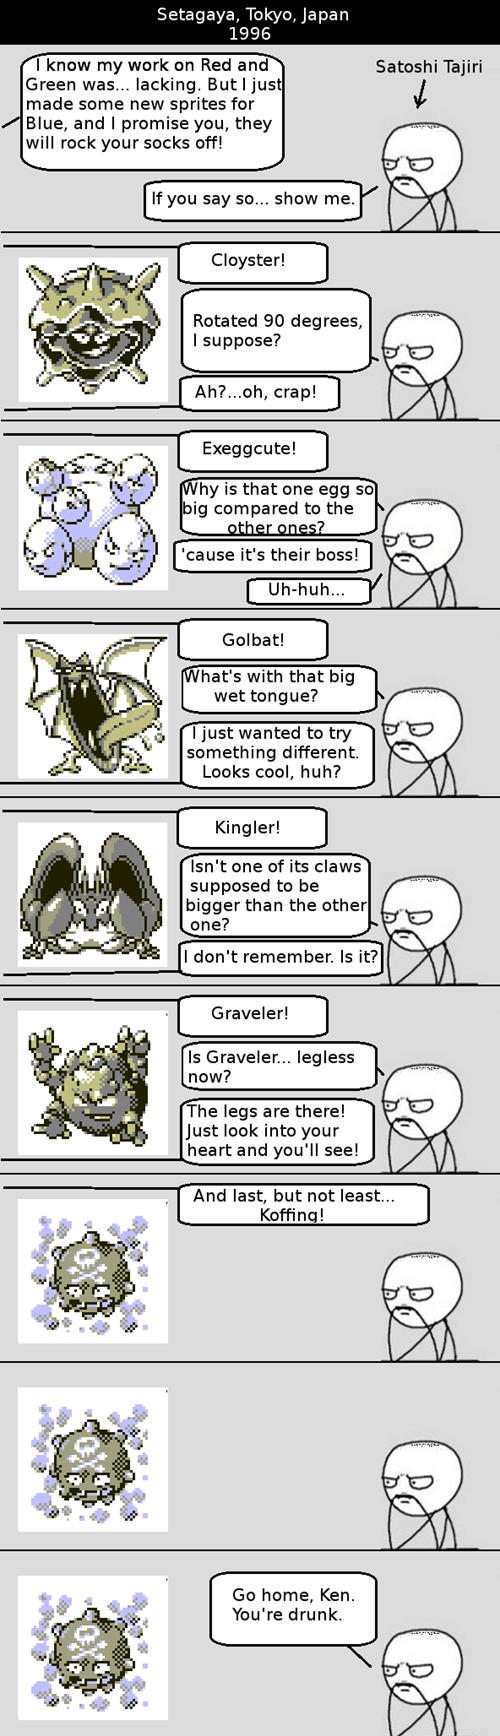 Pokémon meth design classic - 7044272640